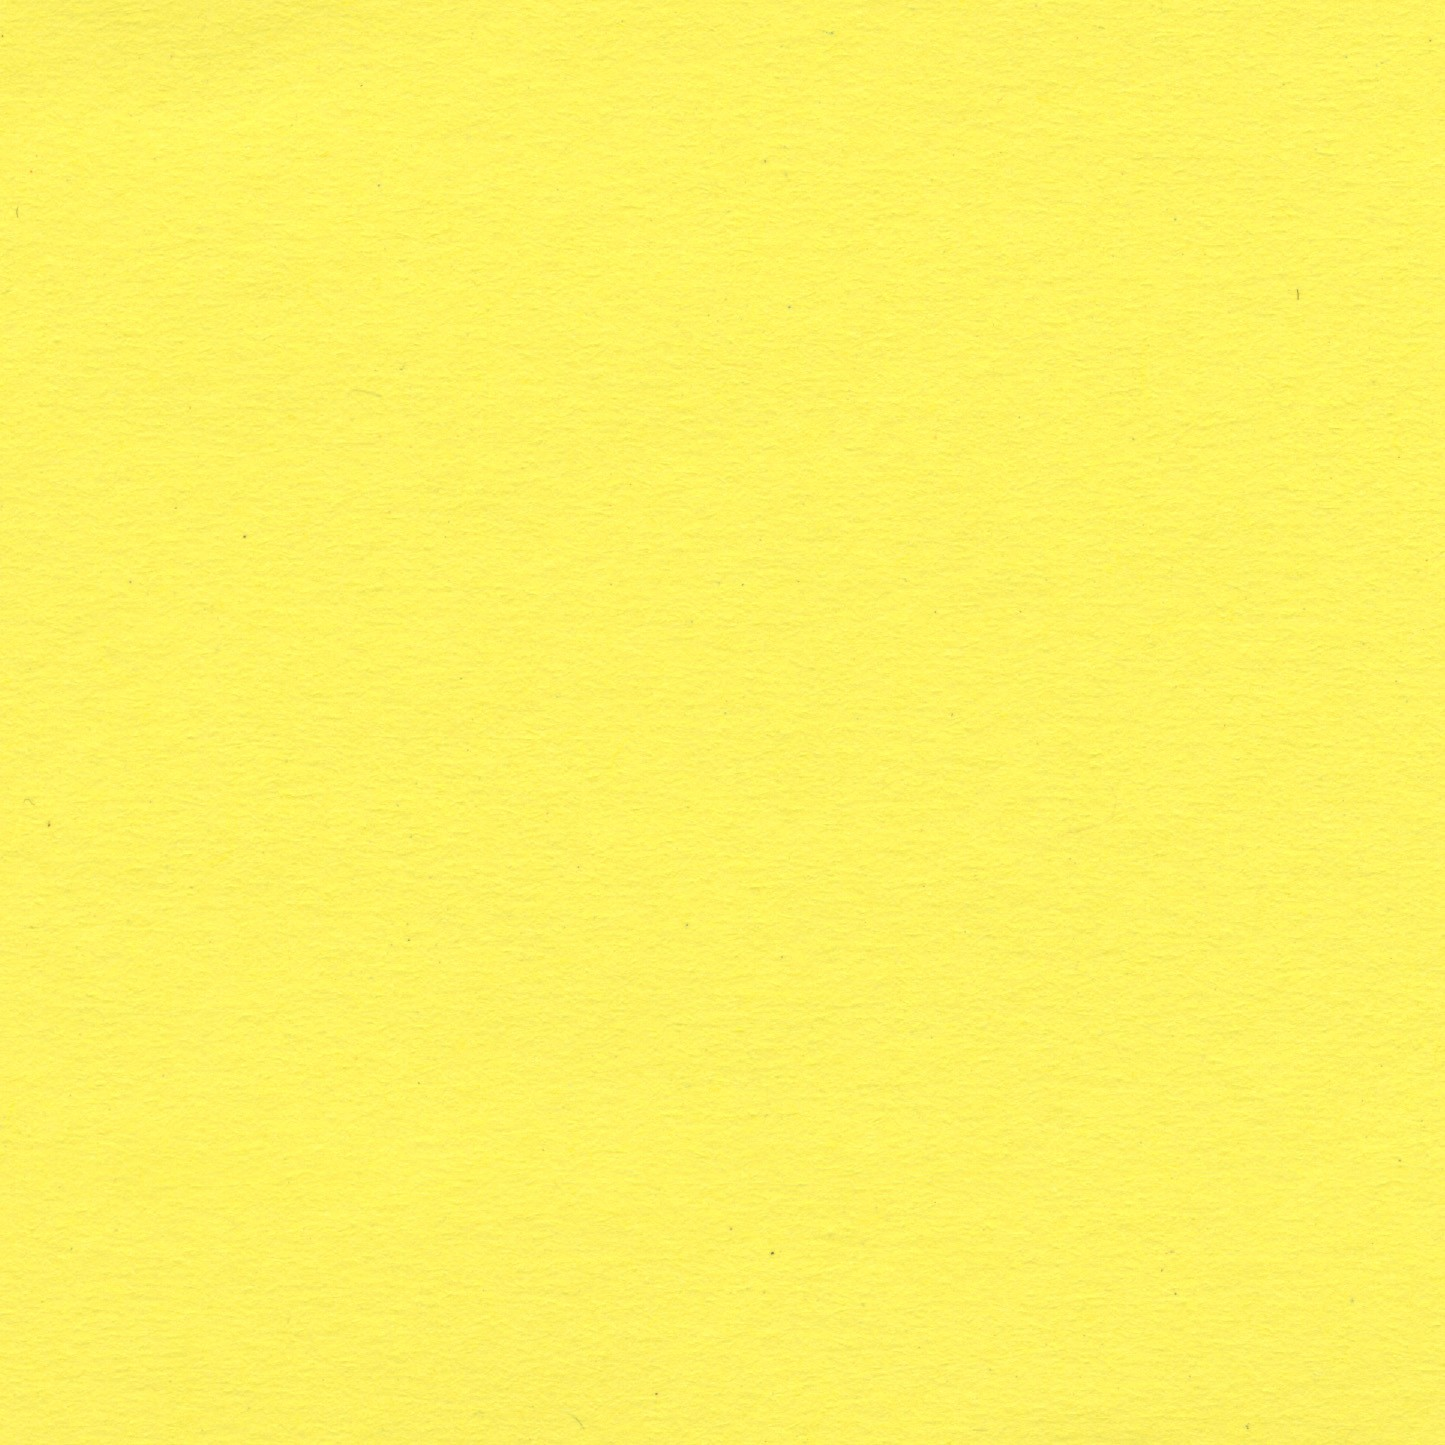 Yellow - Bright 150gsm